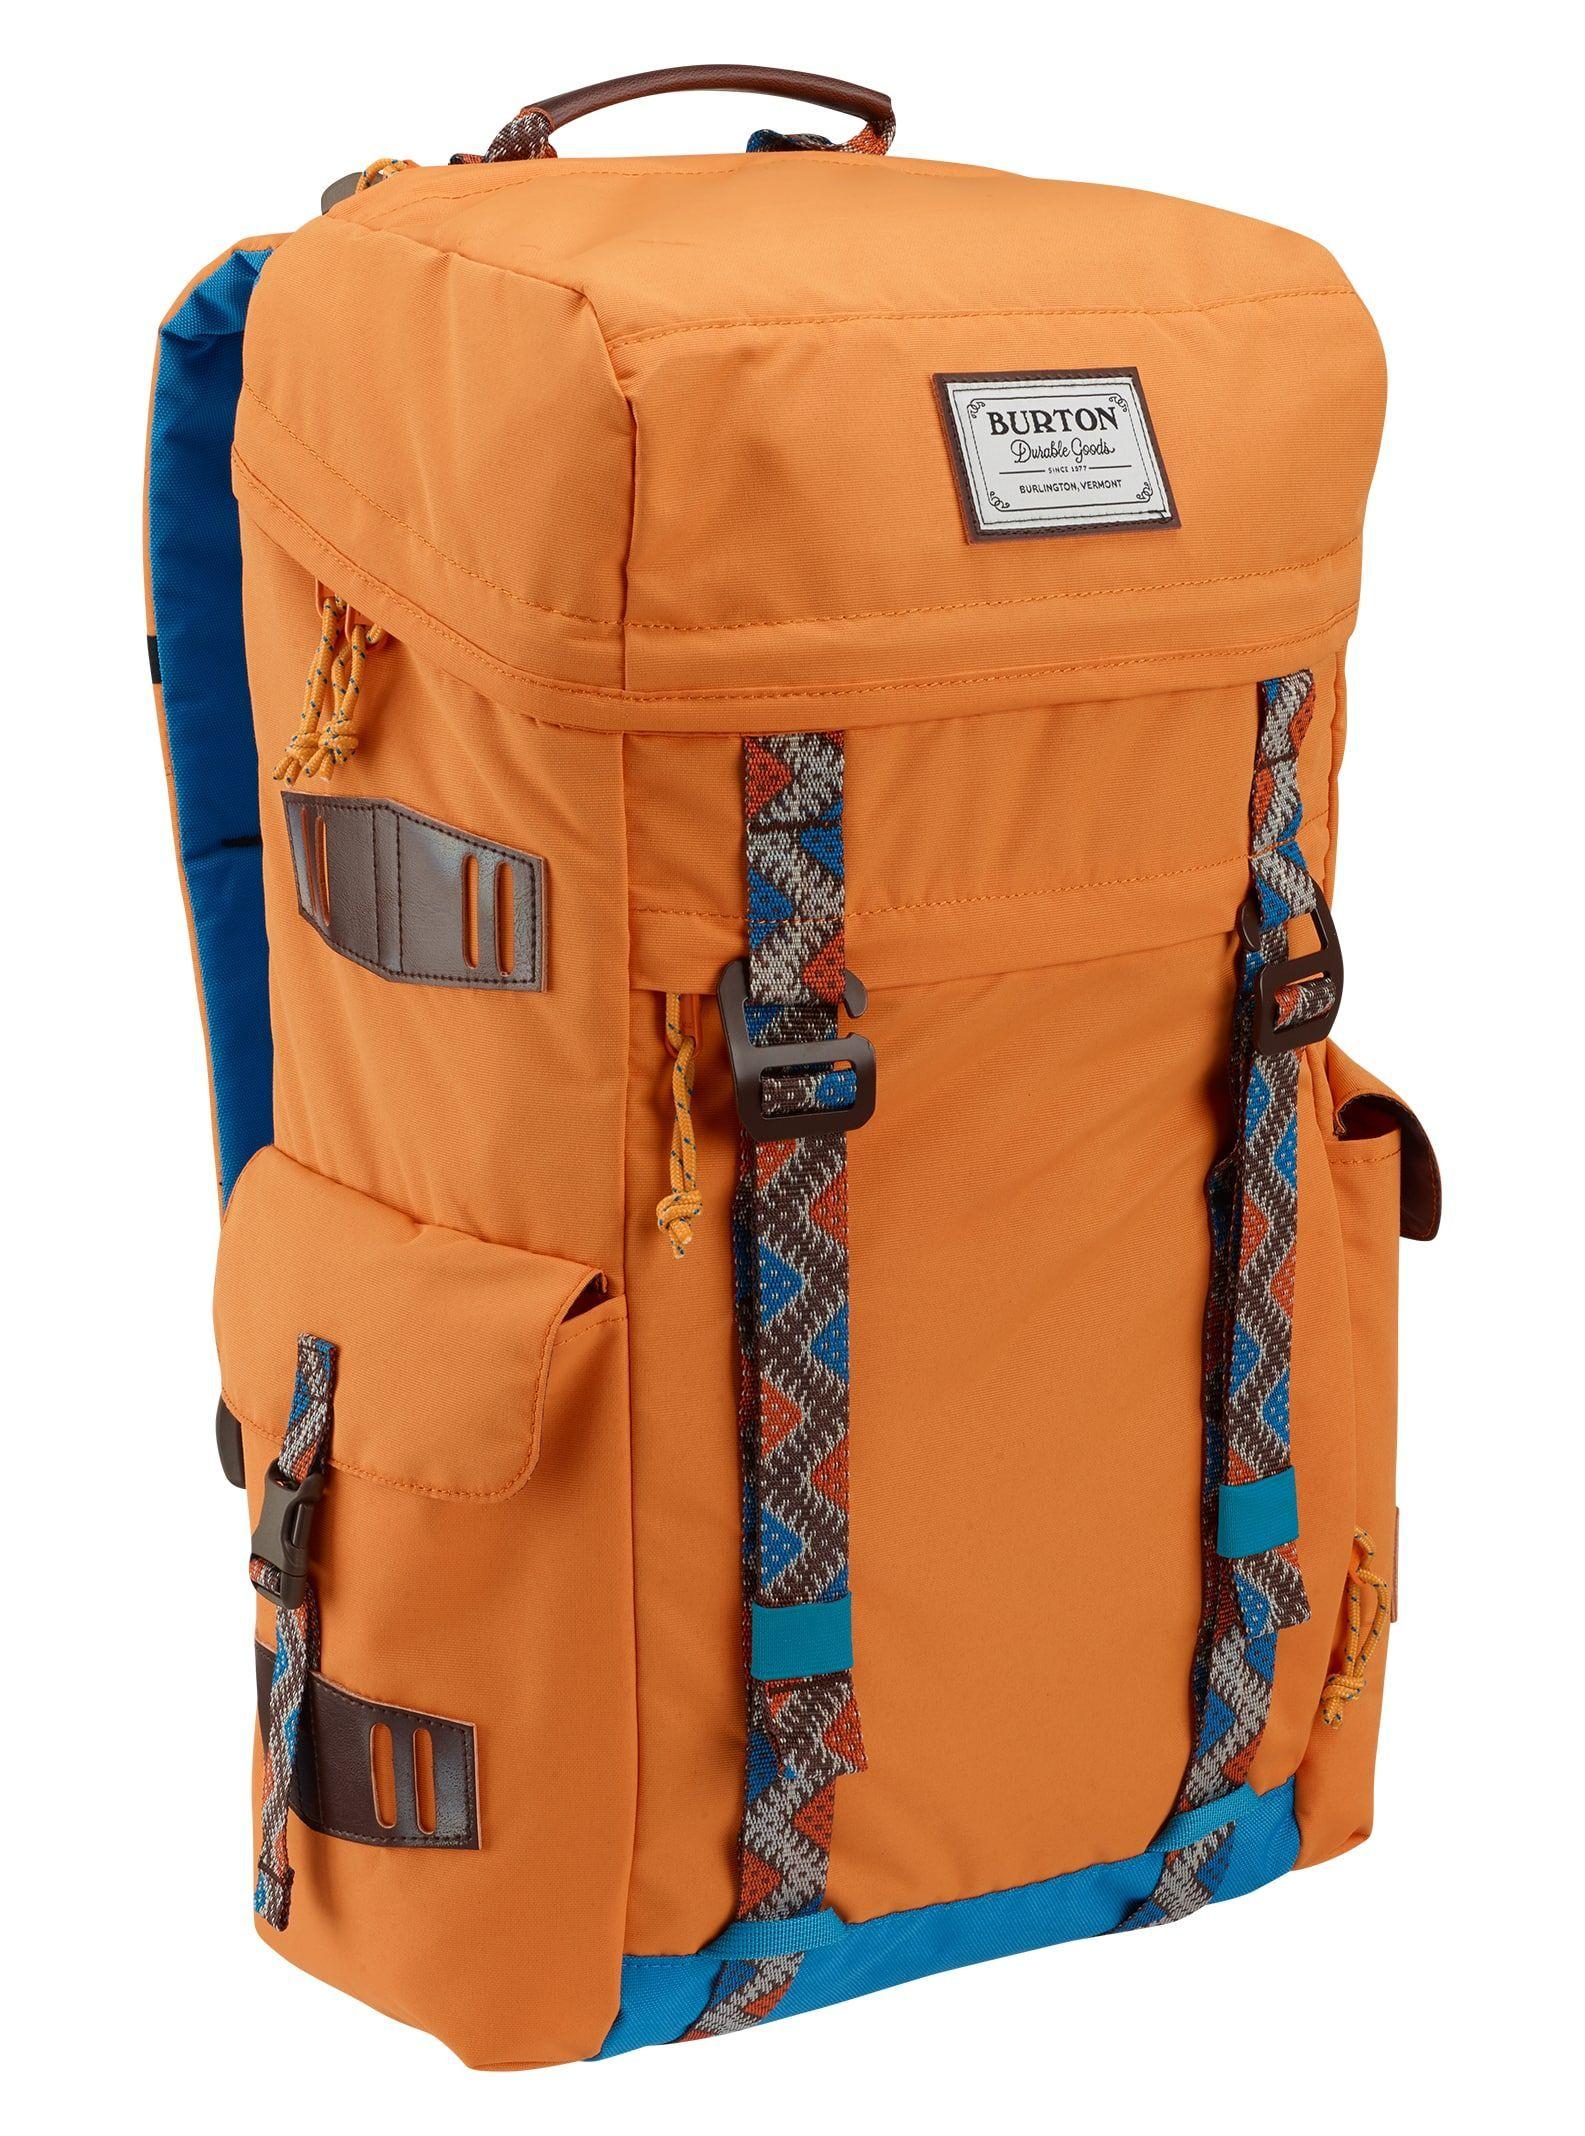 74c737fdc1 Burton Annex Backpack